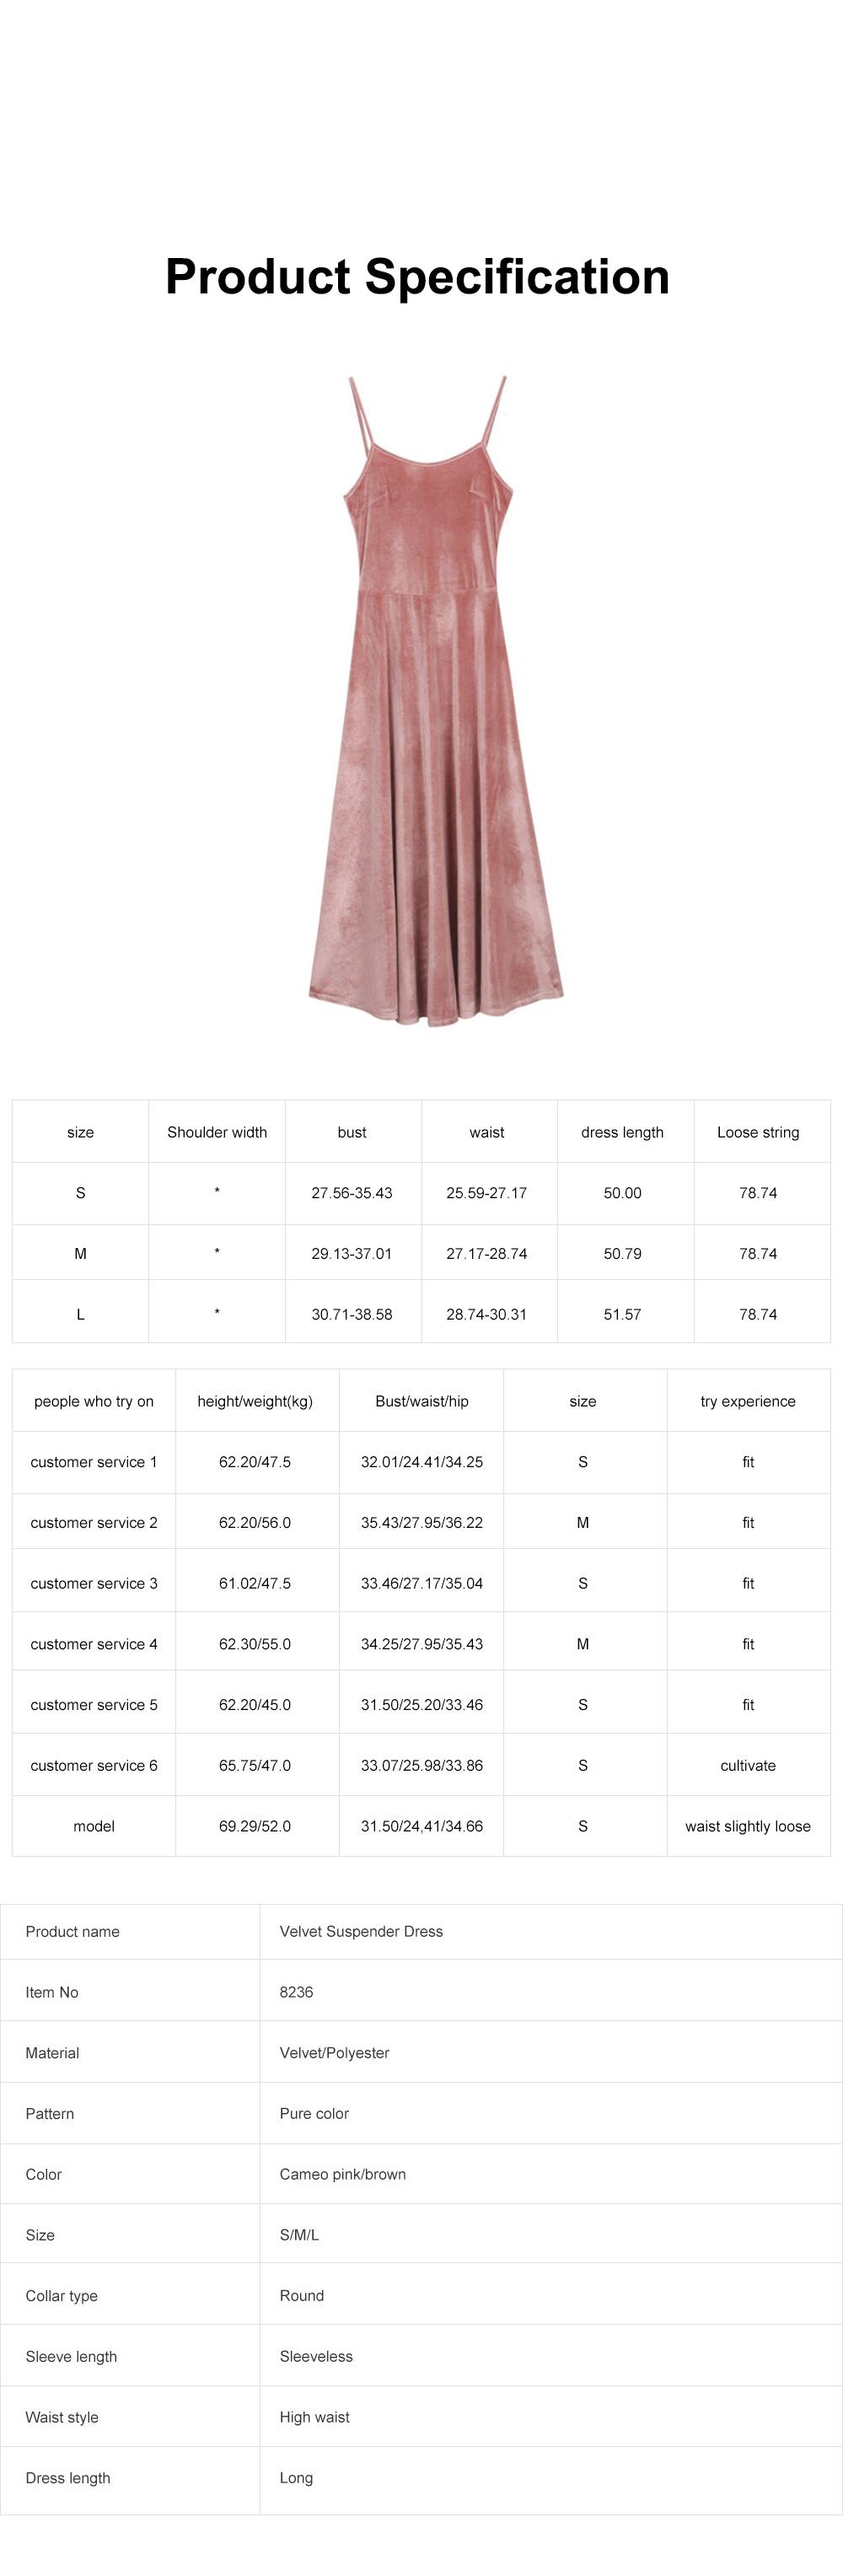 Women's Overall Suspender Dress Velvet Classic Retro Style with High Waist and Back Strap Ankle Length Bottoming Vest Skirt 6